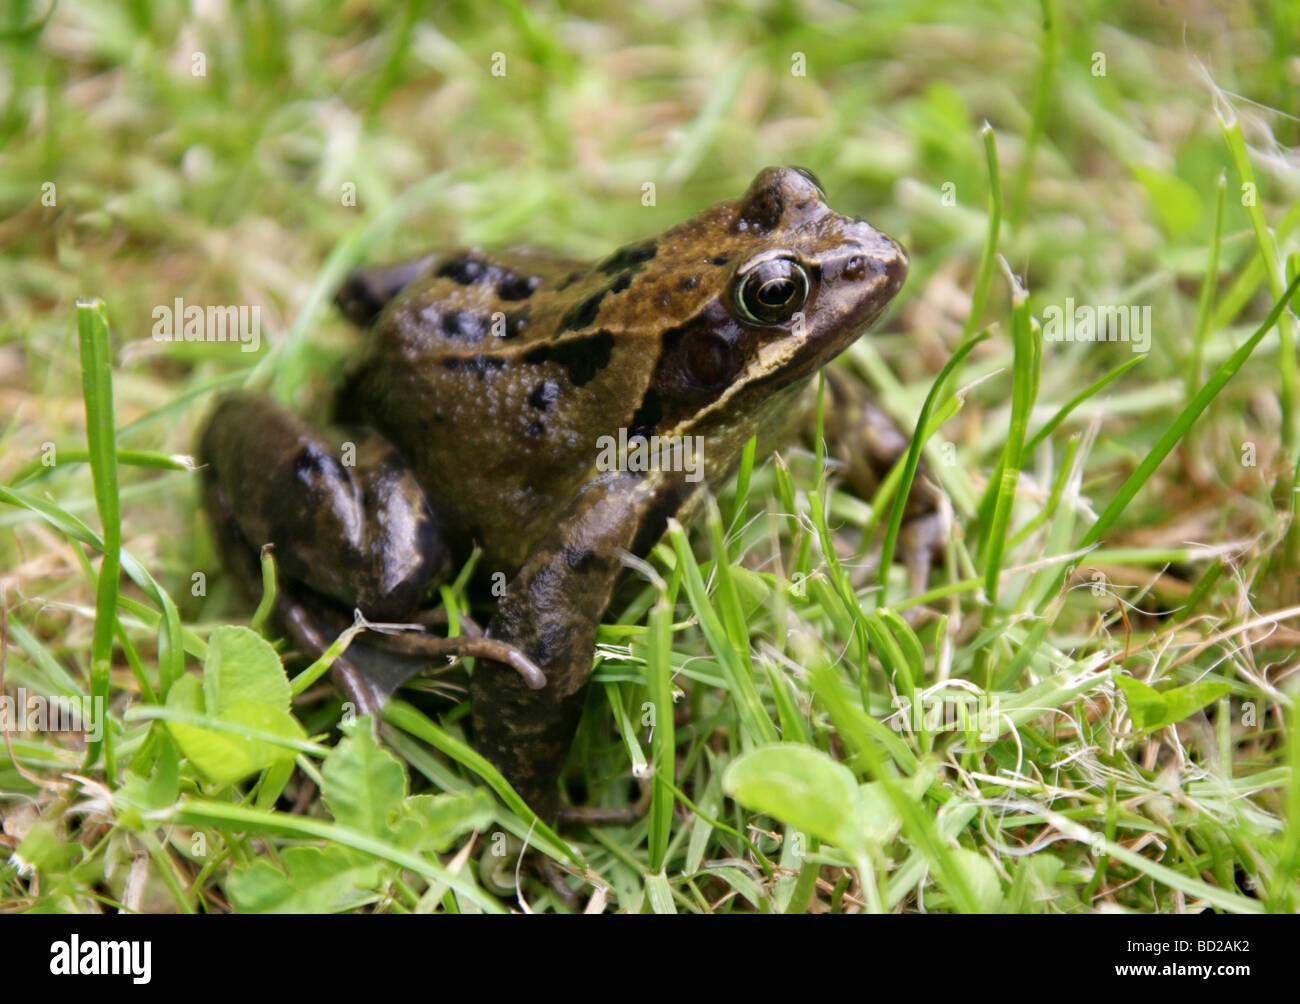 Common Frog, European Common Frog or European Common Brown Frog, Rana temporaria, Ranidae. A Common British Amphibian. - Stock Image